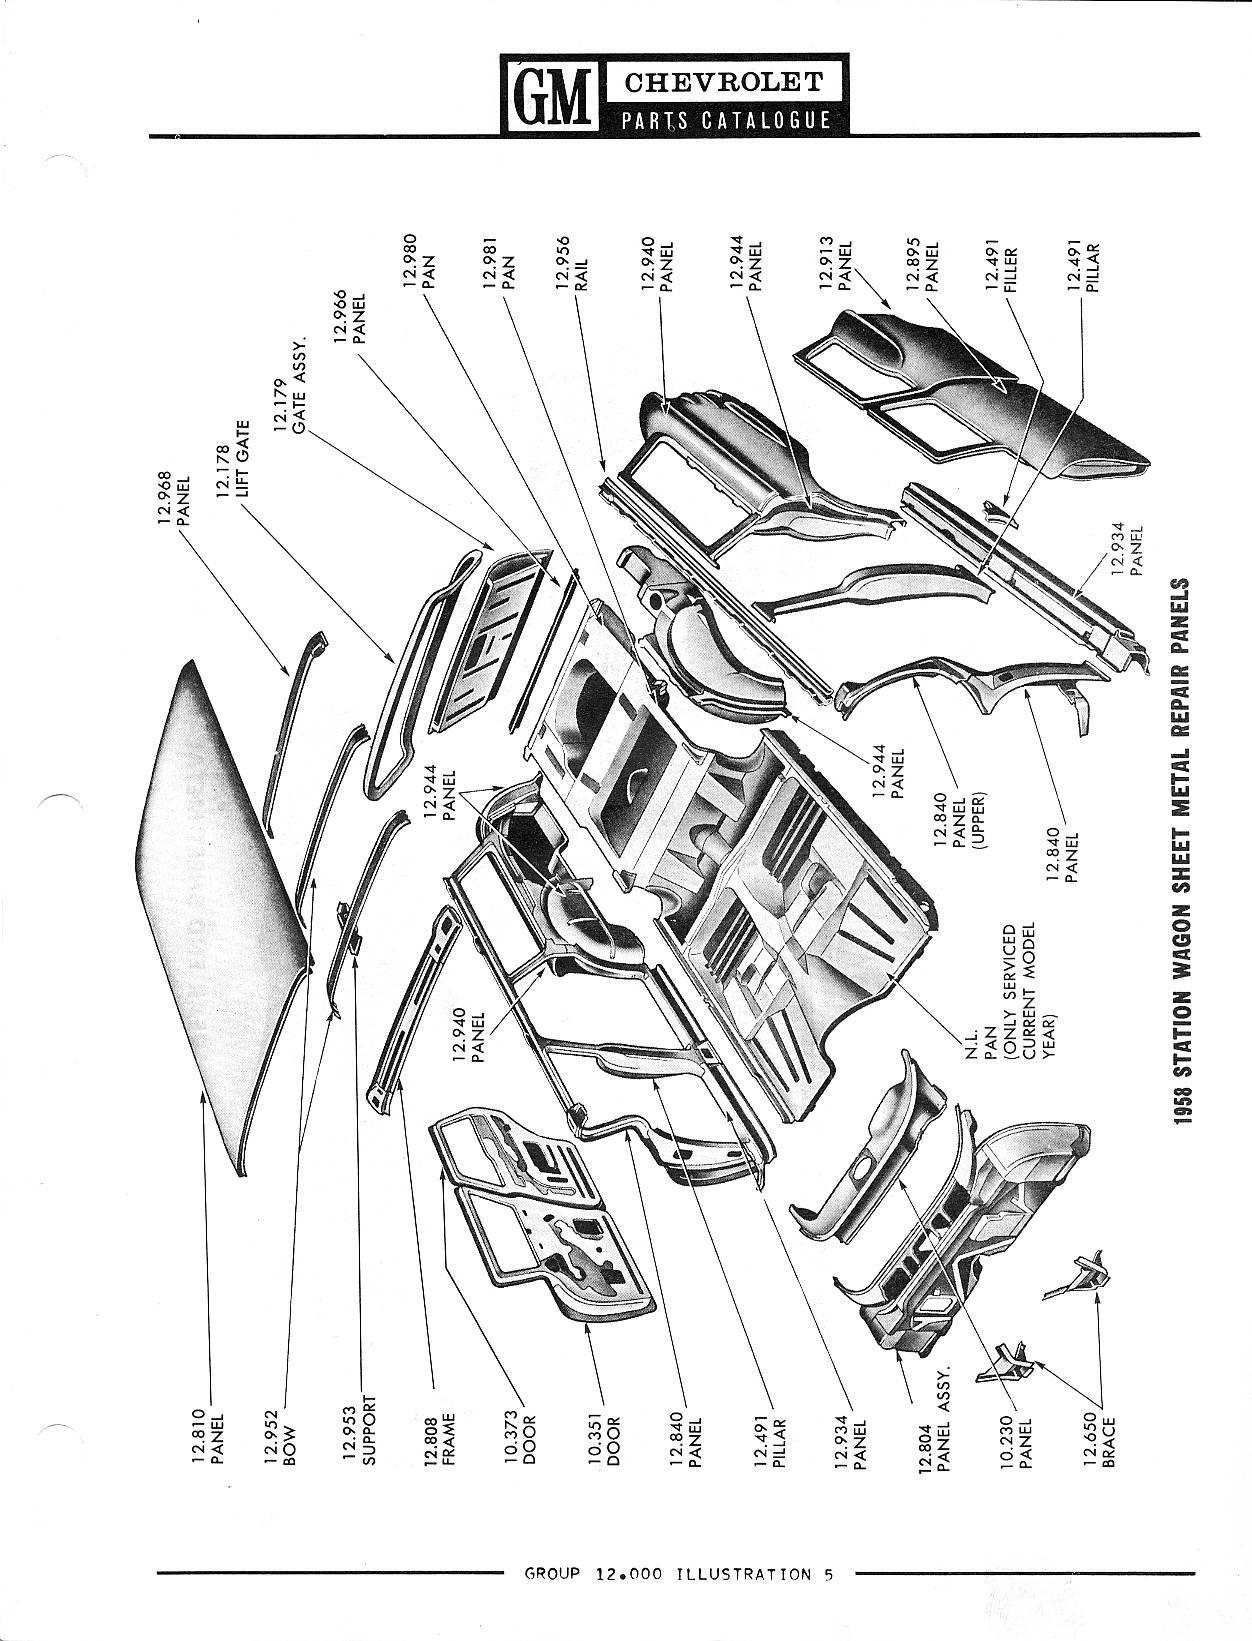 1958-1968 Chevrolet Parts Catalog / Image161.jpg